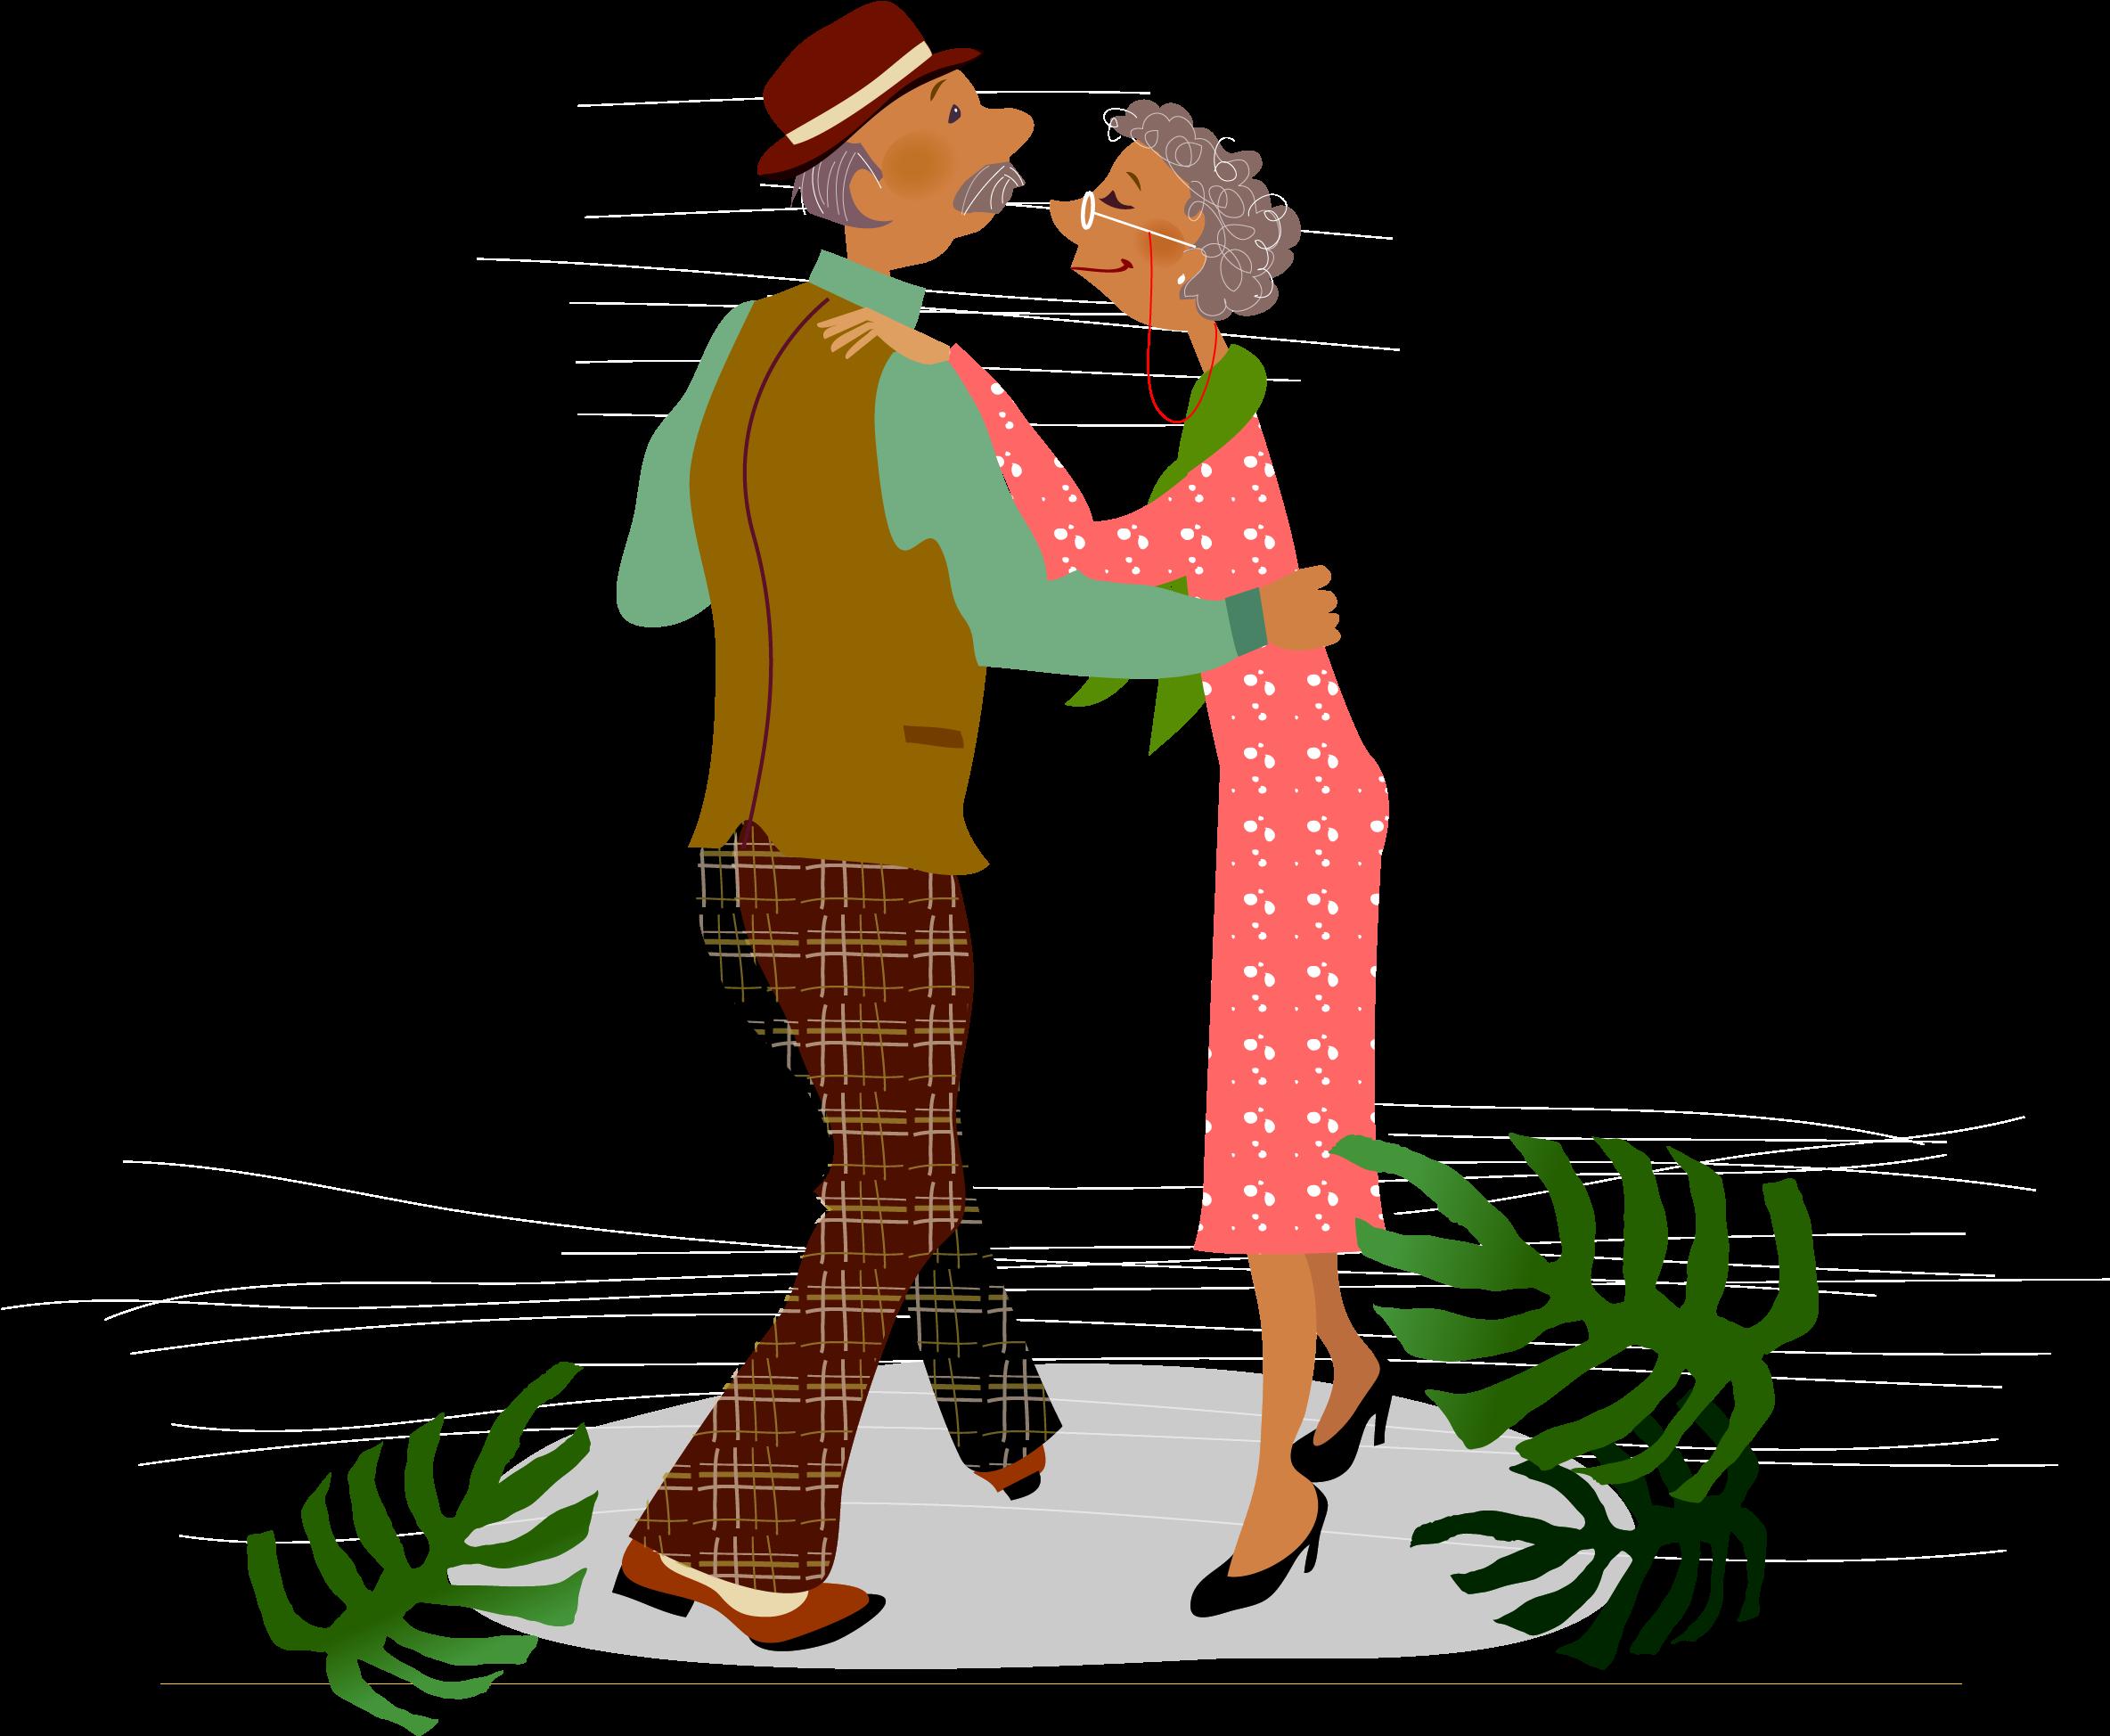 картинки о пенсионерах для афиши данного цветотипа